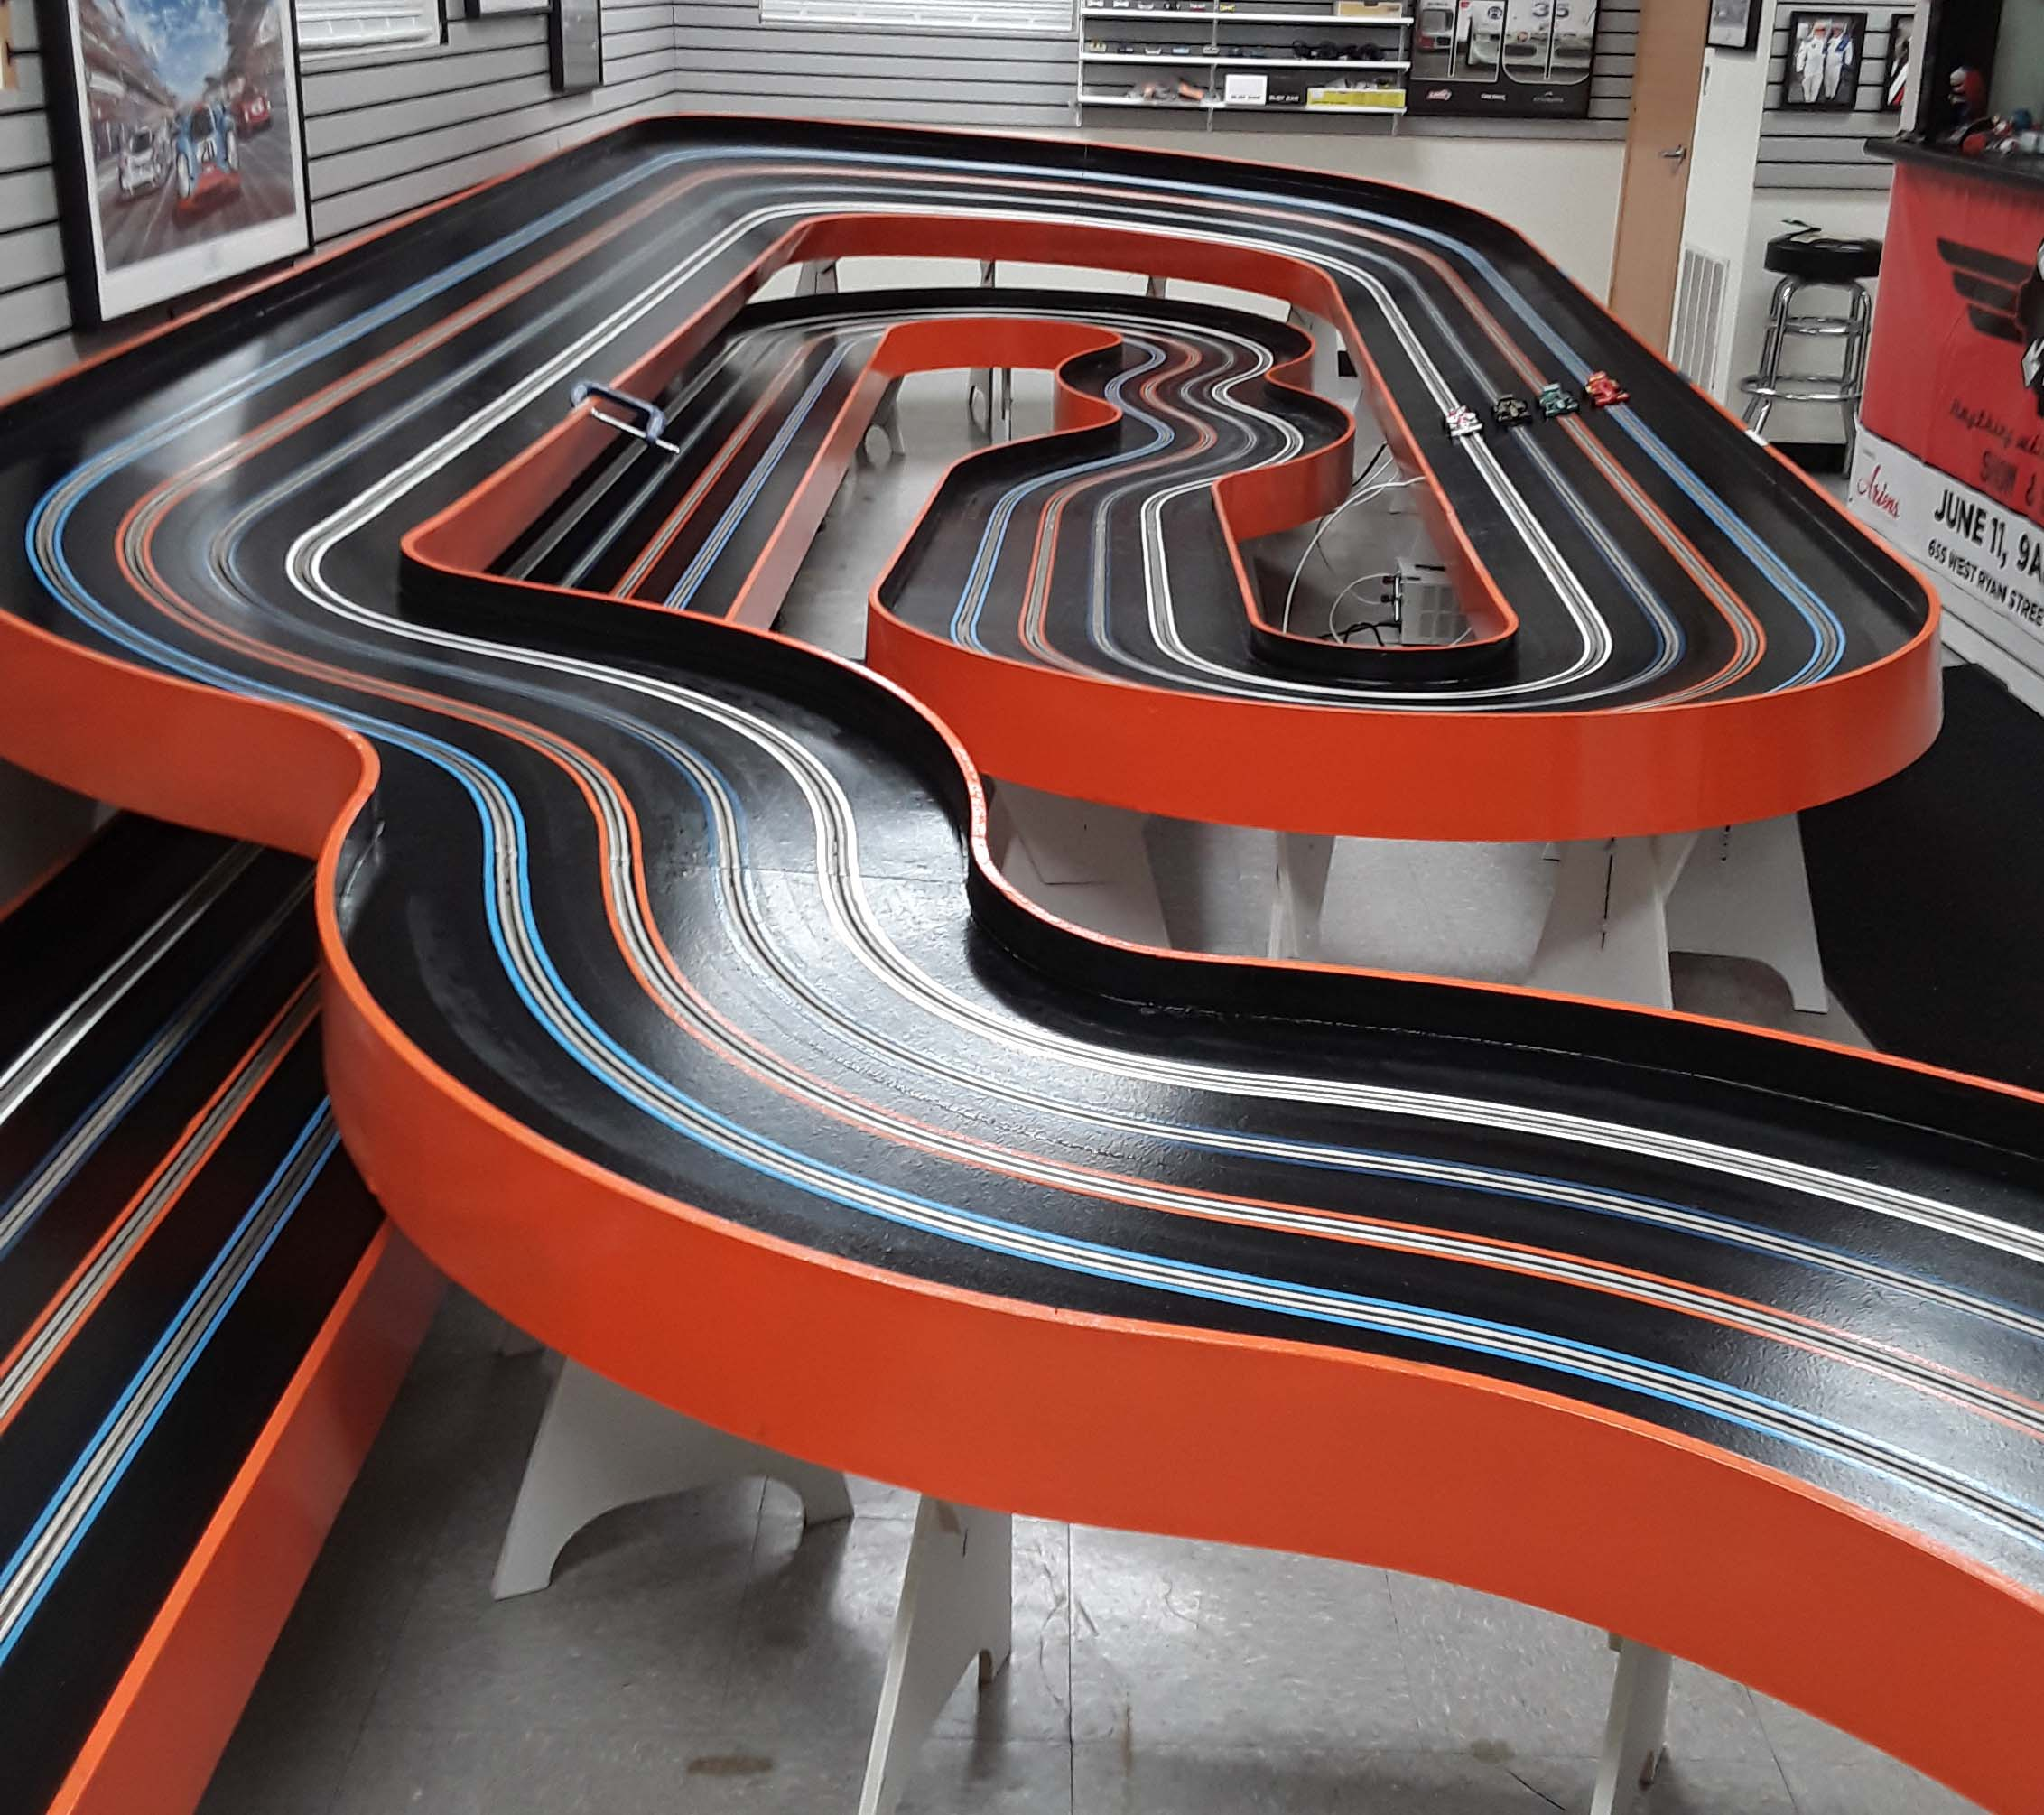 Elkhart Lake 4 lane home slot car track